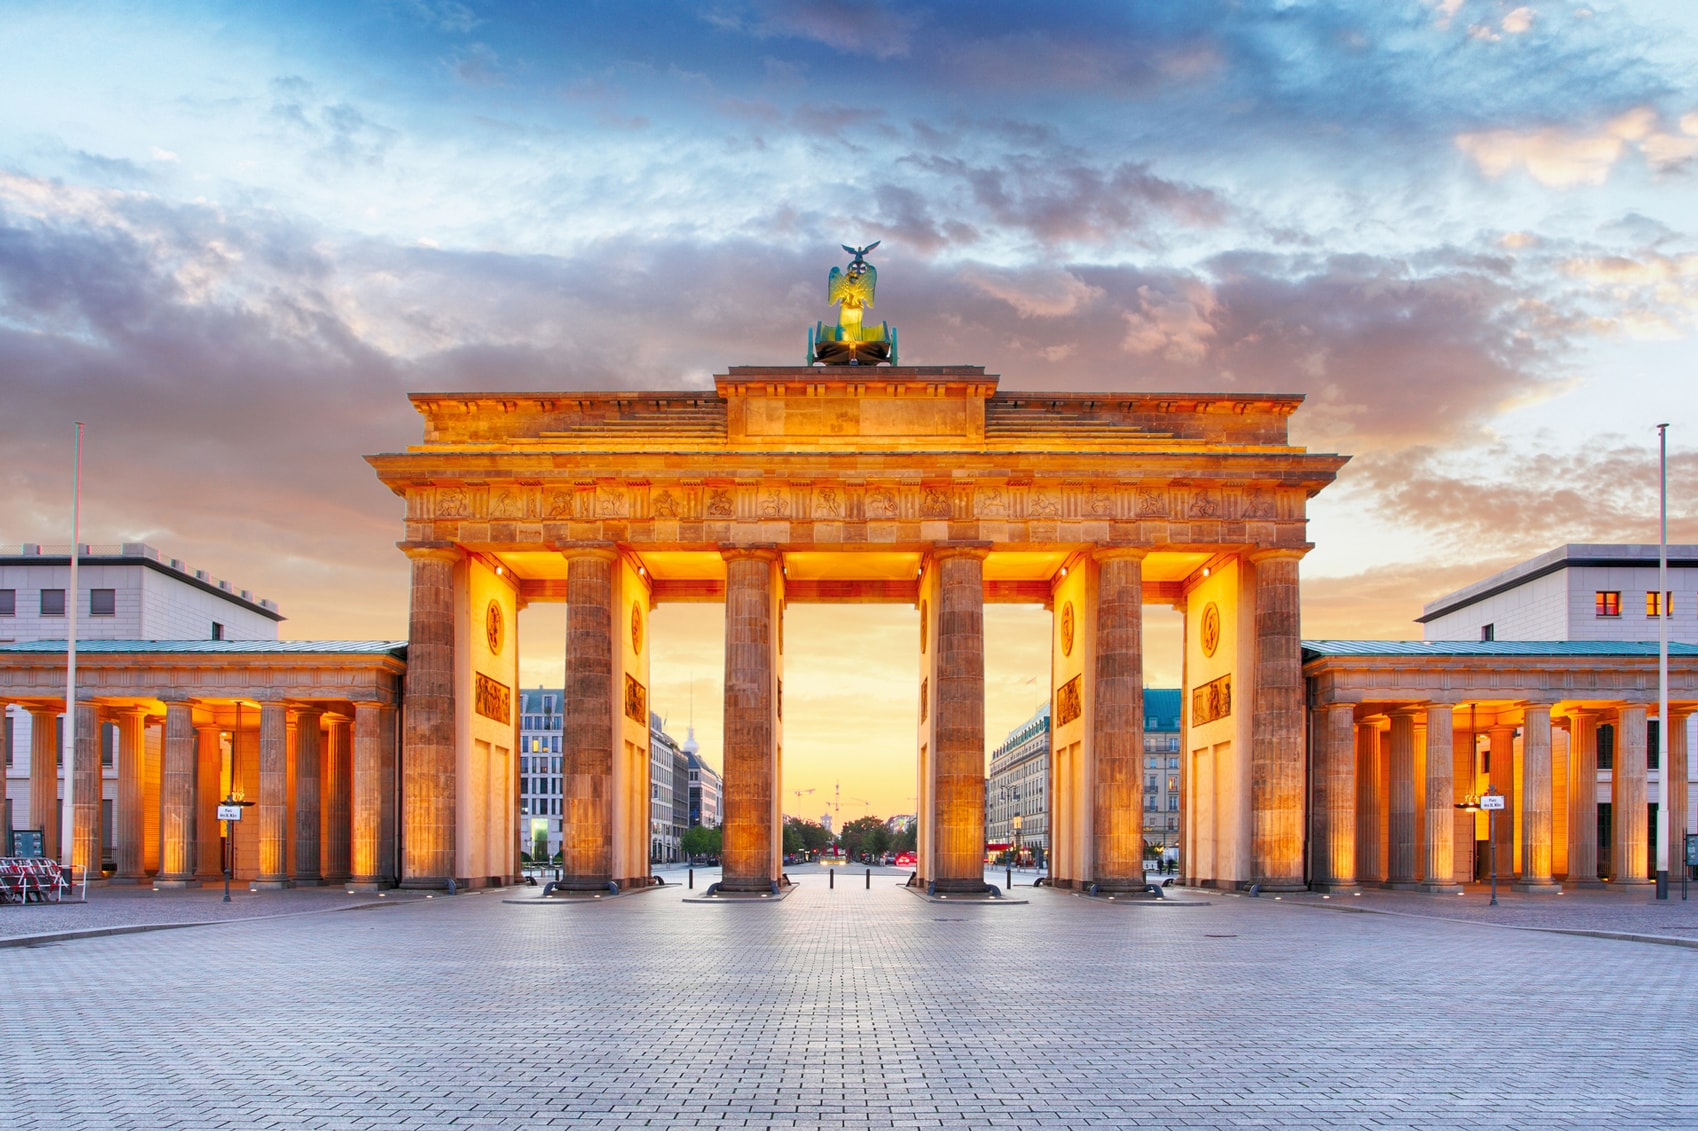 Incredible German Sights Berlin-www.istockphoto.com_gb_photo_berlin-brandenburg-gate-at-night-gm494161874-77297715-TomasSereda